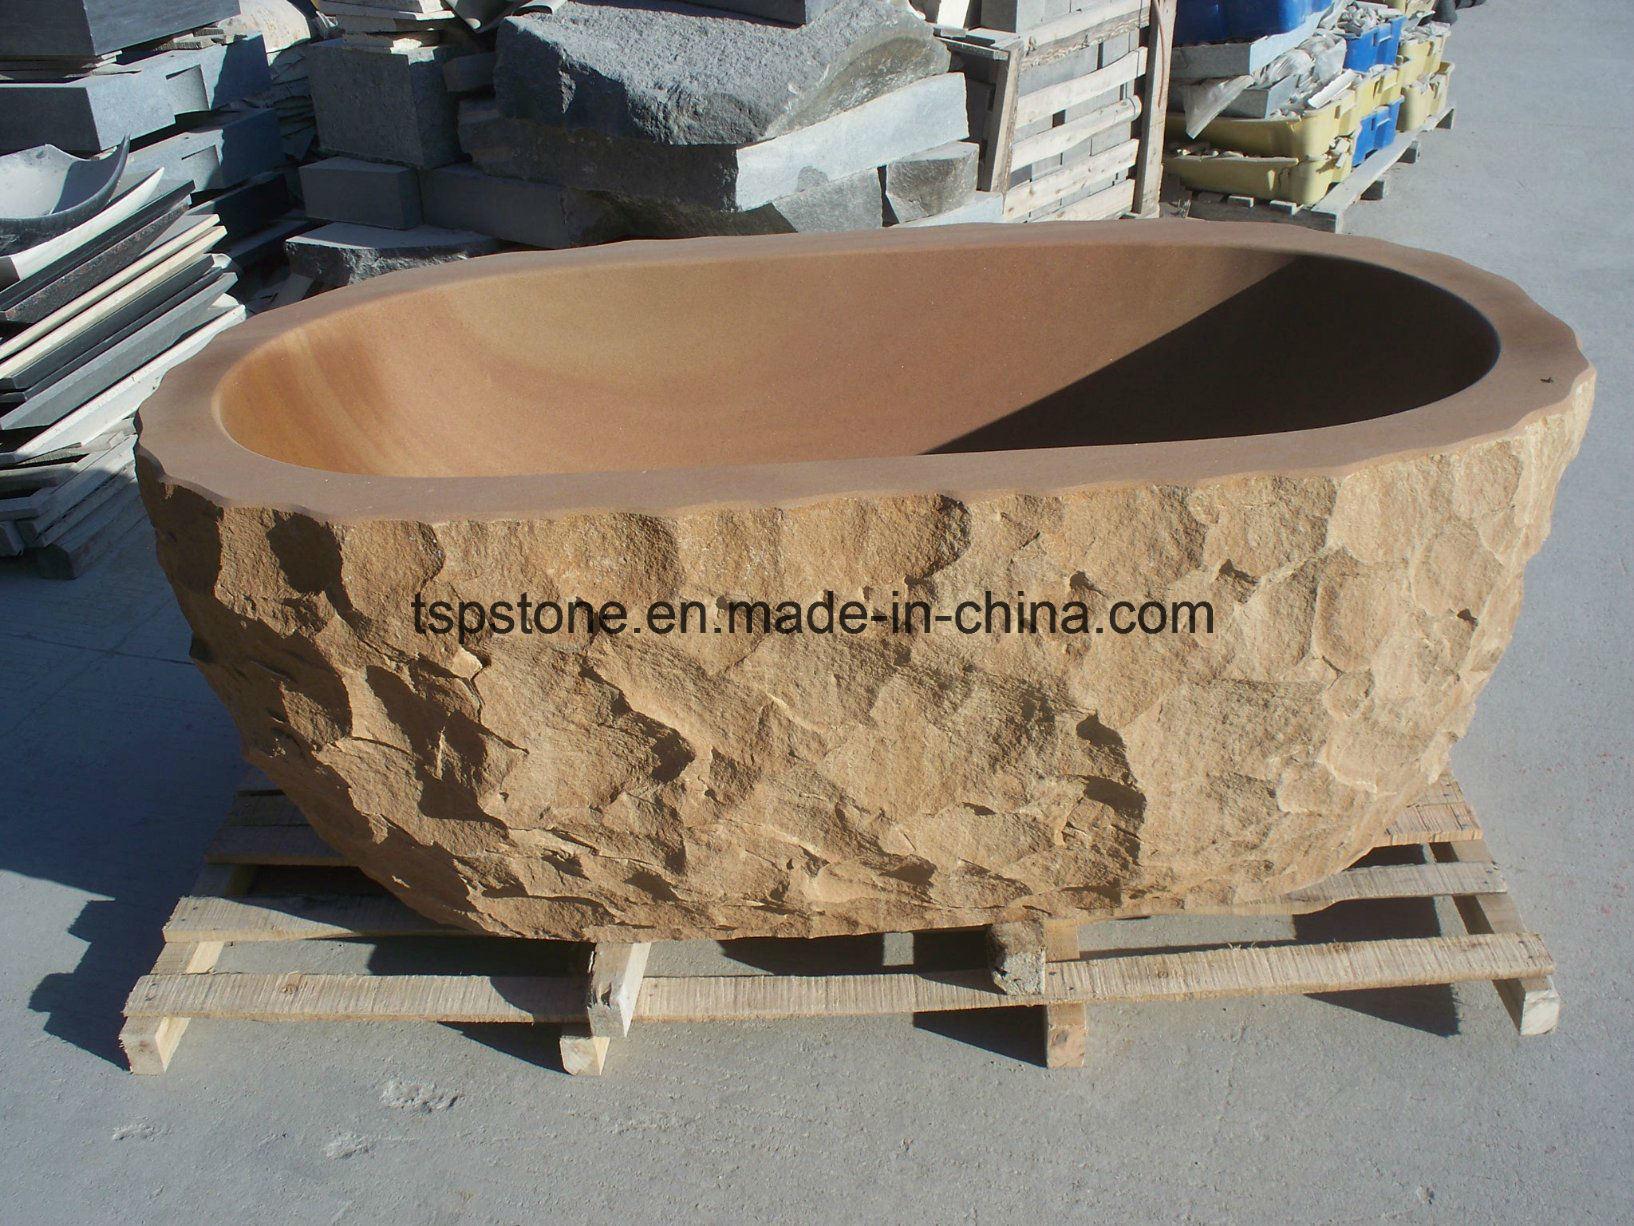 marble bathtubs florentine granite bathtub inc company std what offer we